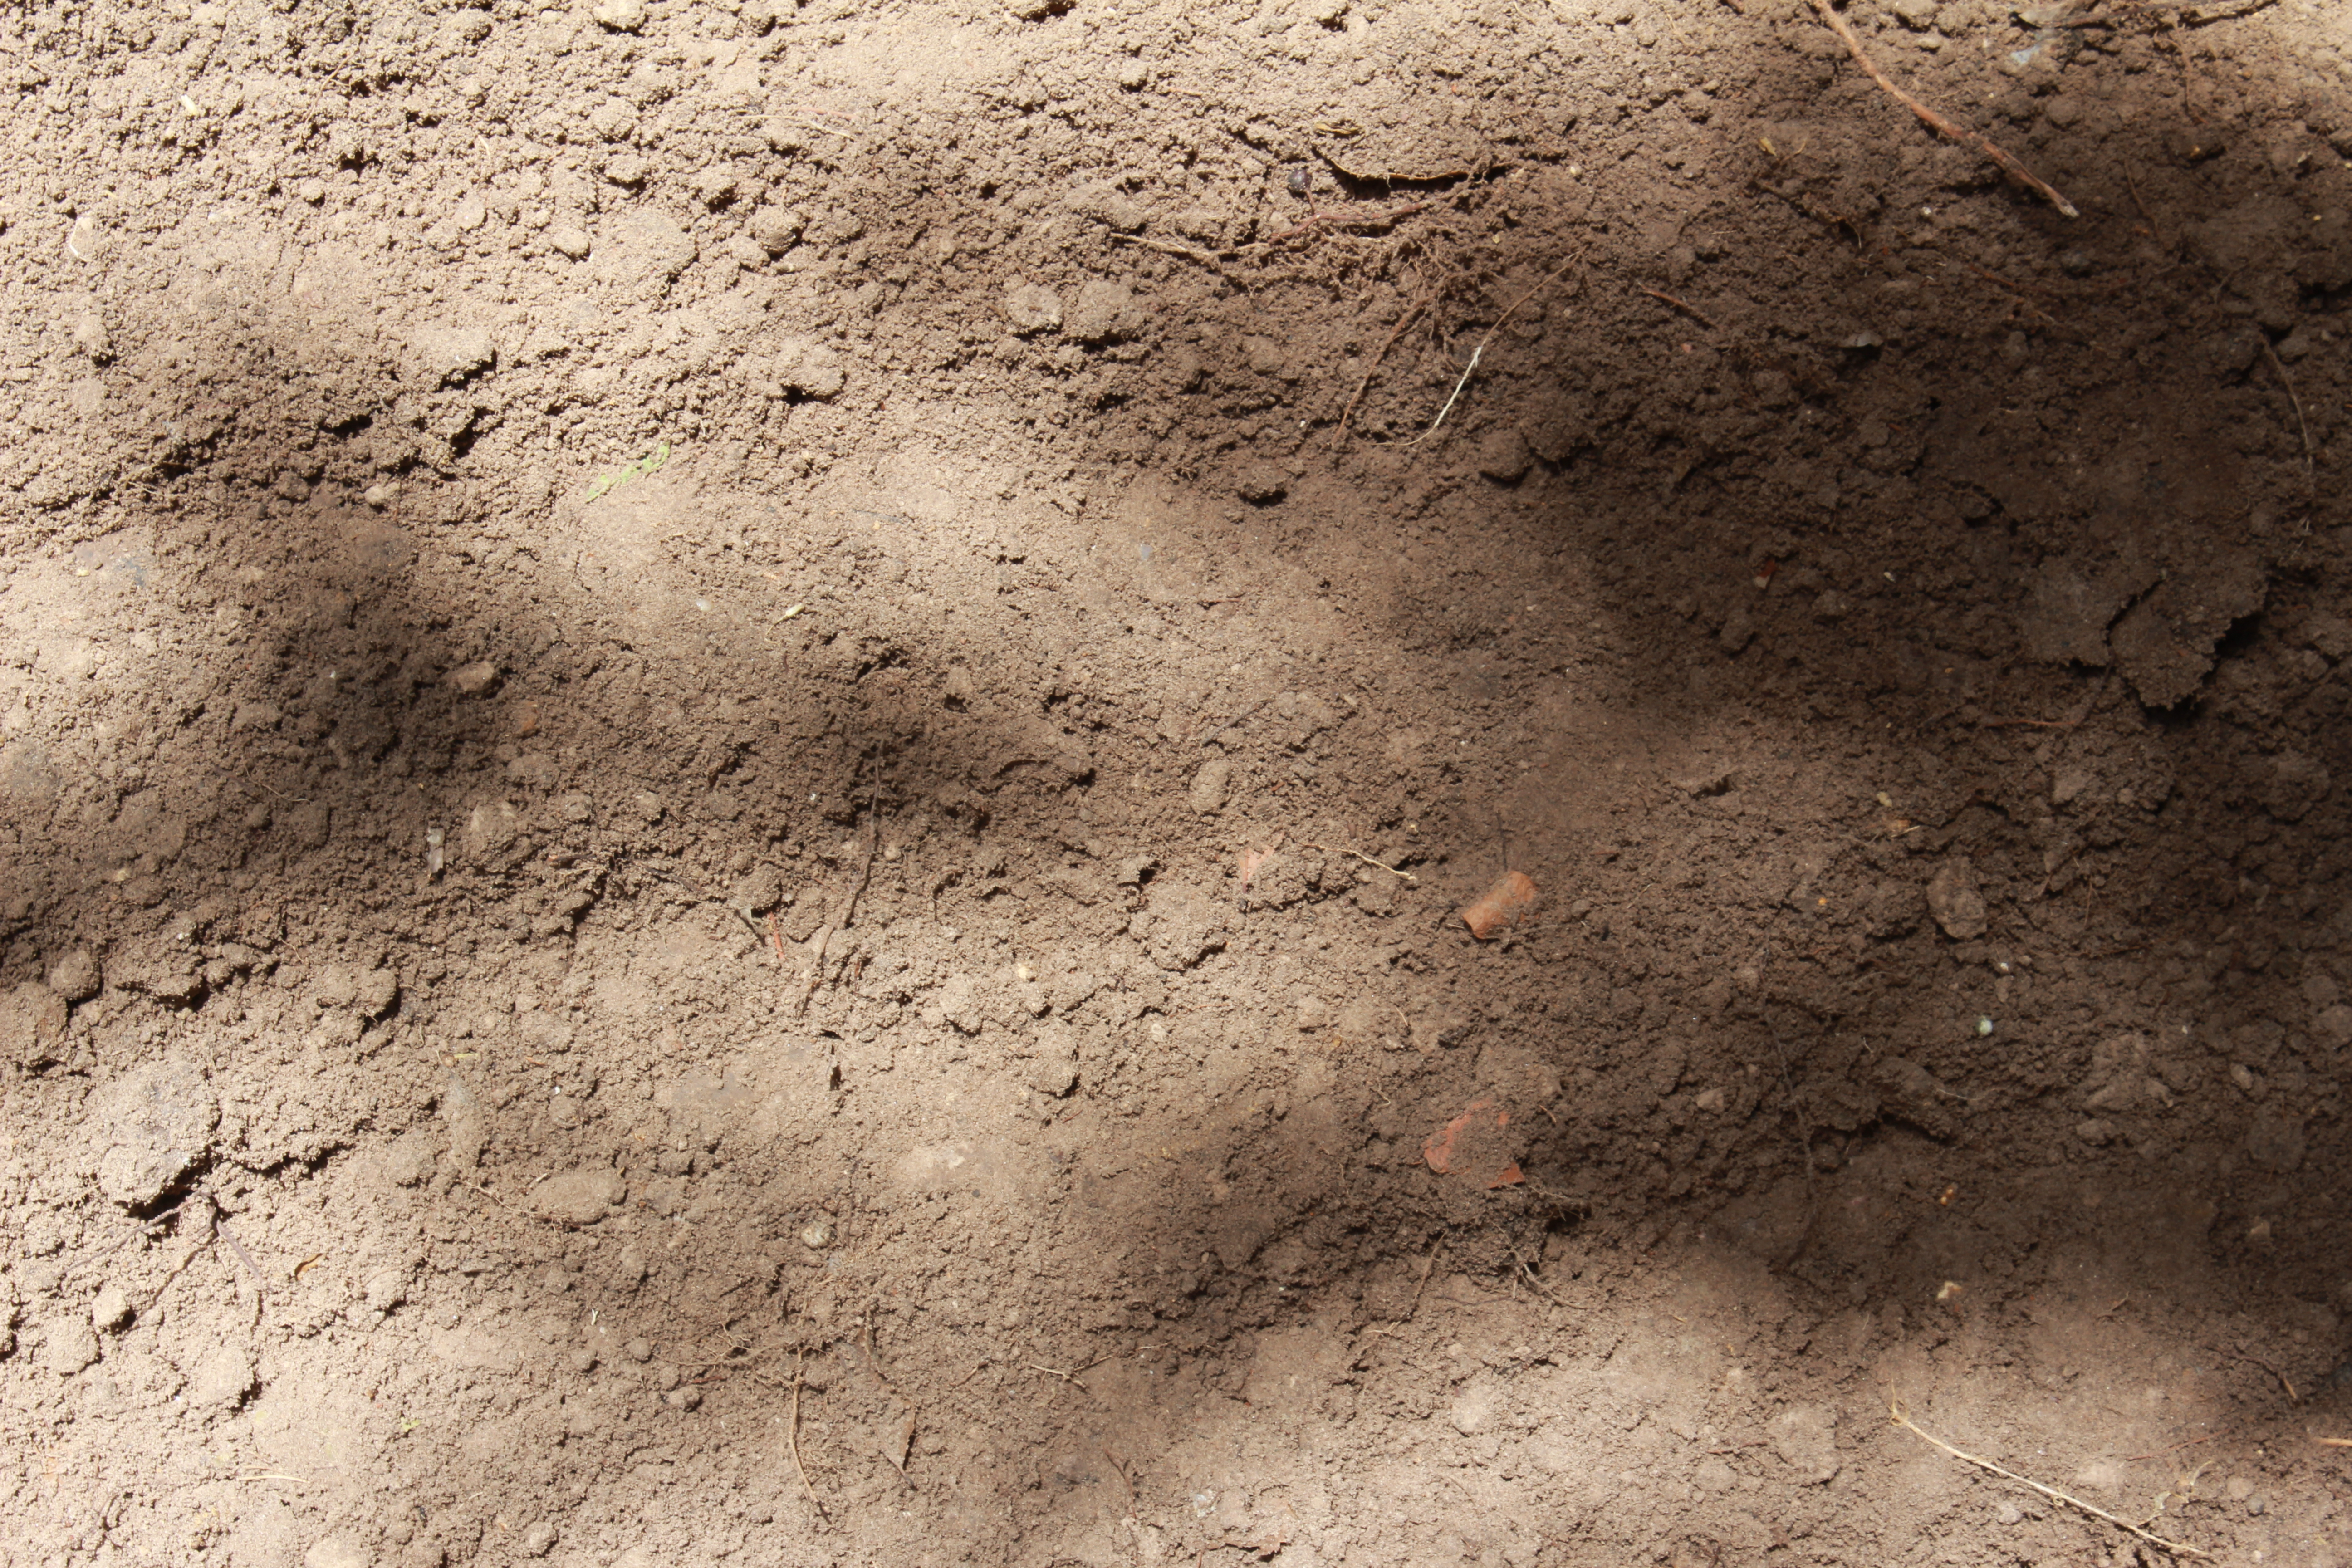 File:Dirt and Mud 001 - Loose Dirt.jpg - Wikimedia Commons